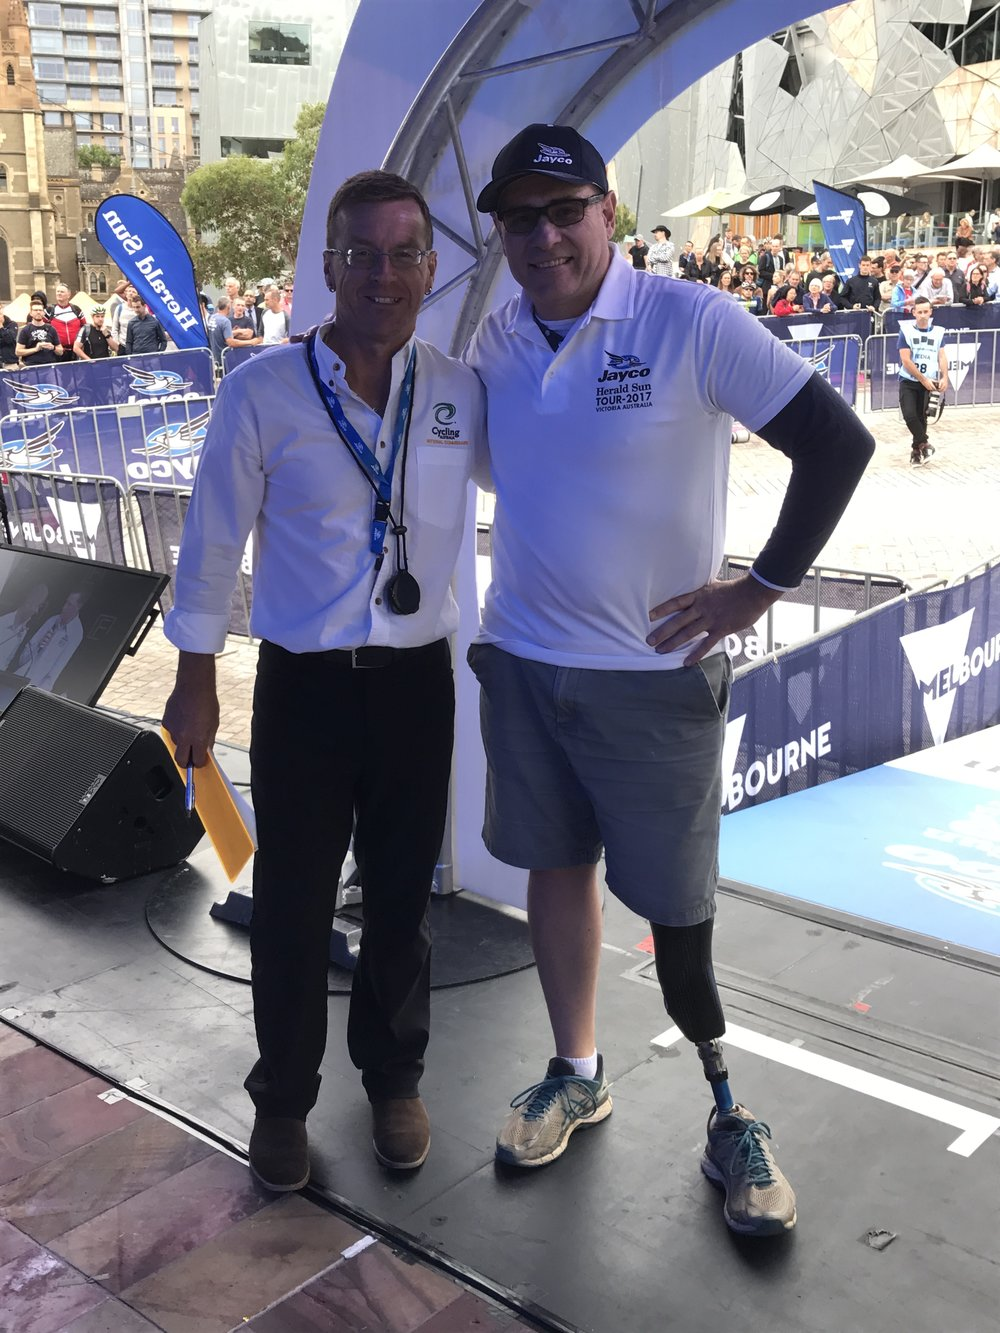 HST 2017 Prologue - Greg Nunn (Judge) & Alex Simmons (BiciSport) on the HST start podium